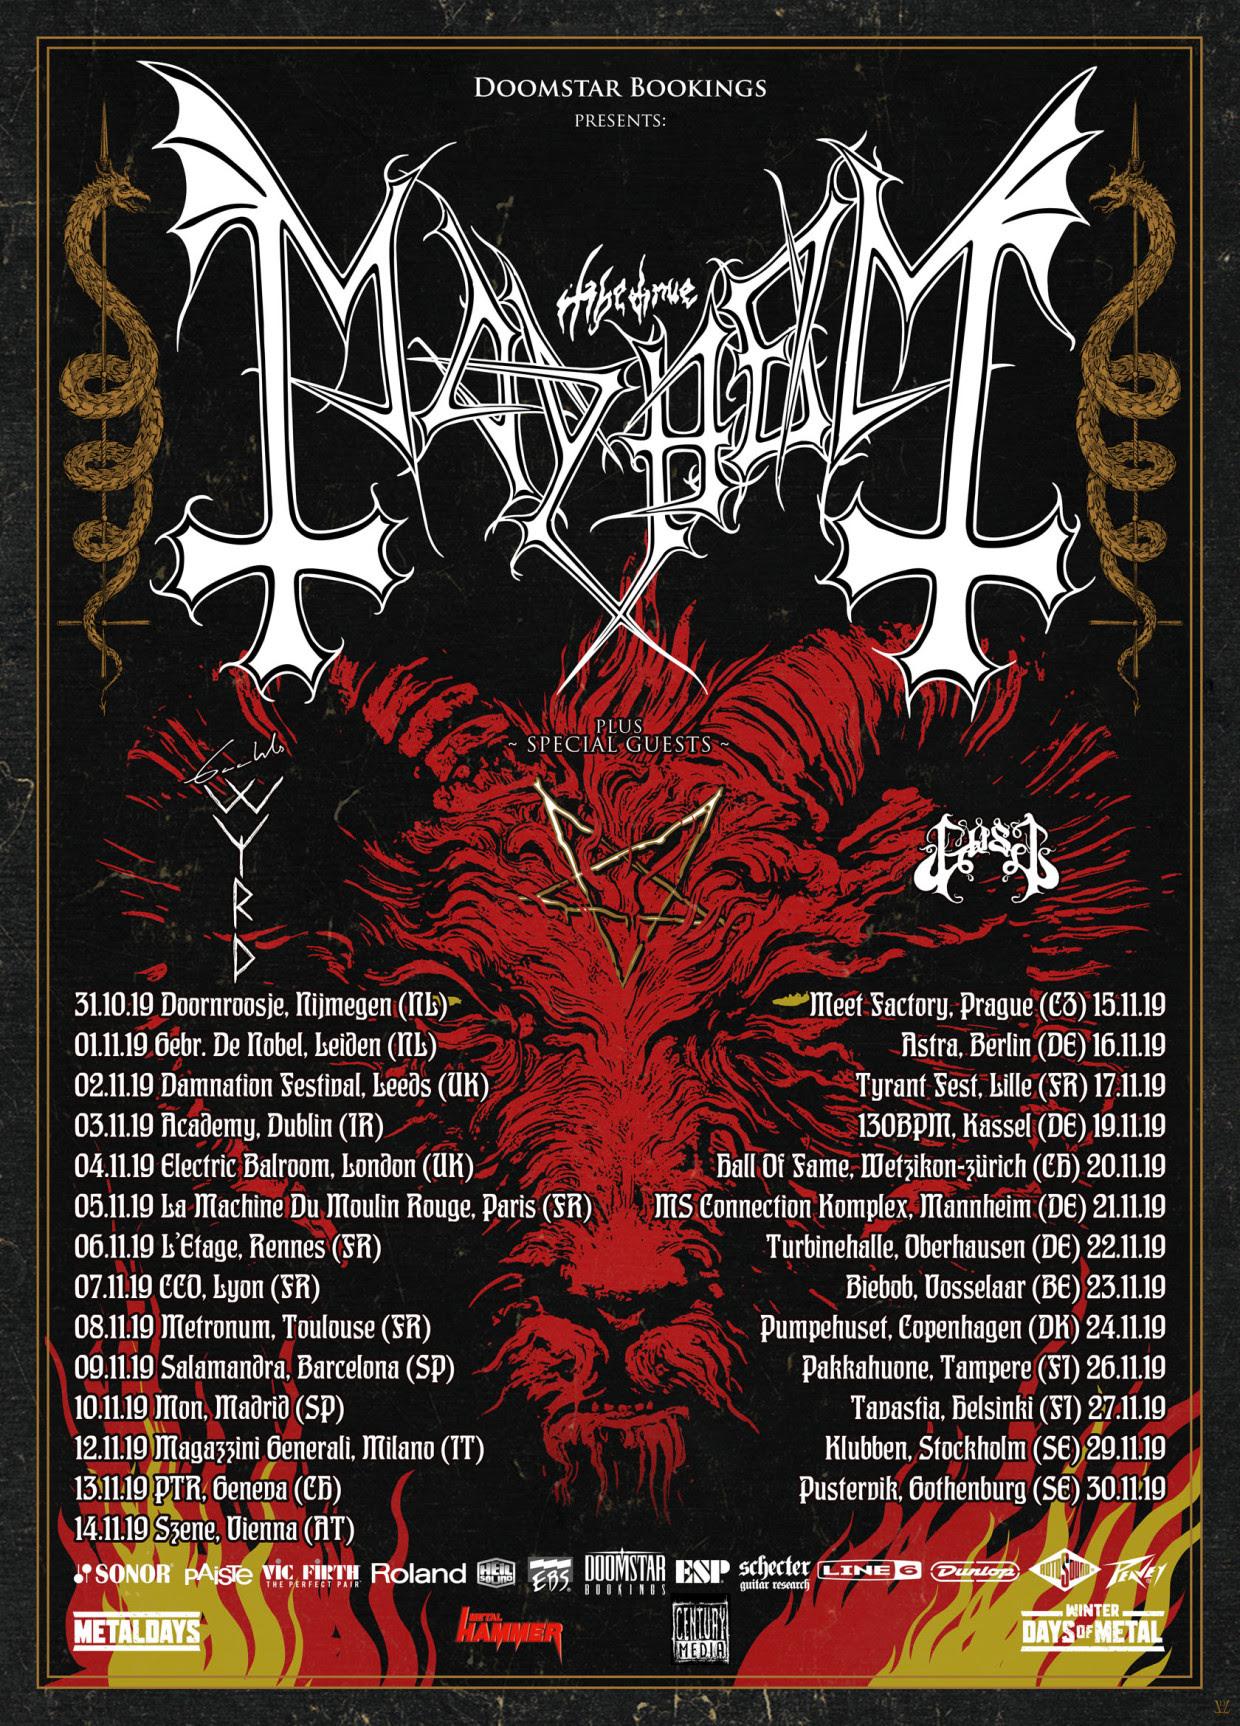 Dark synthwave act GOST announce new album 'Valediction